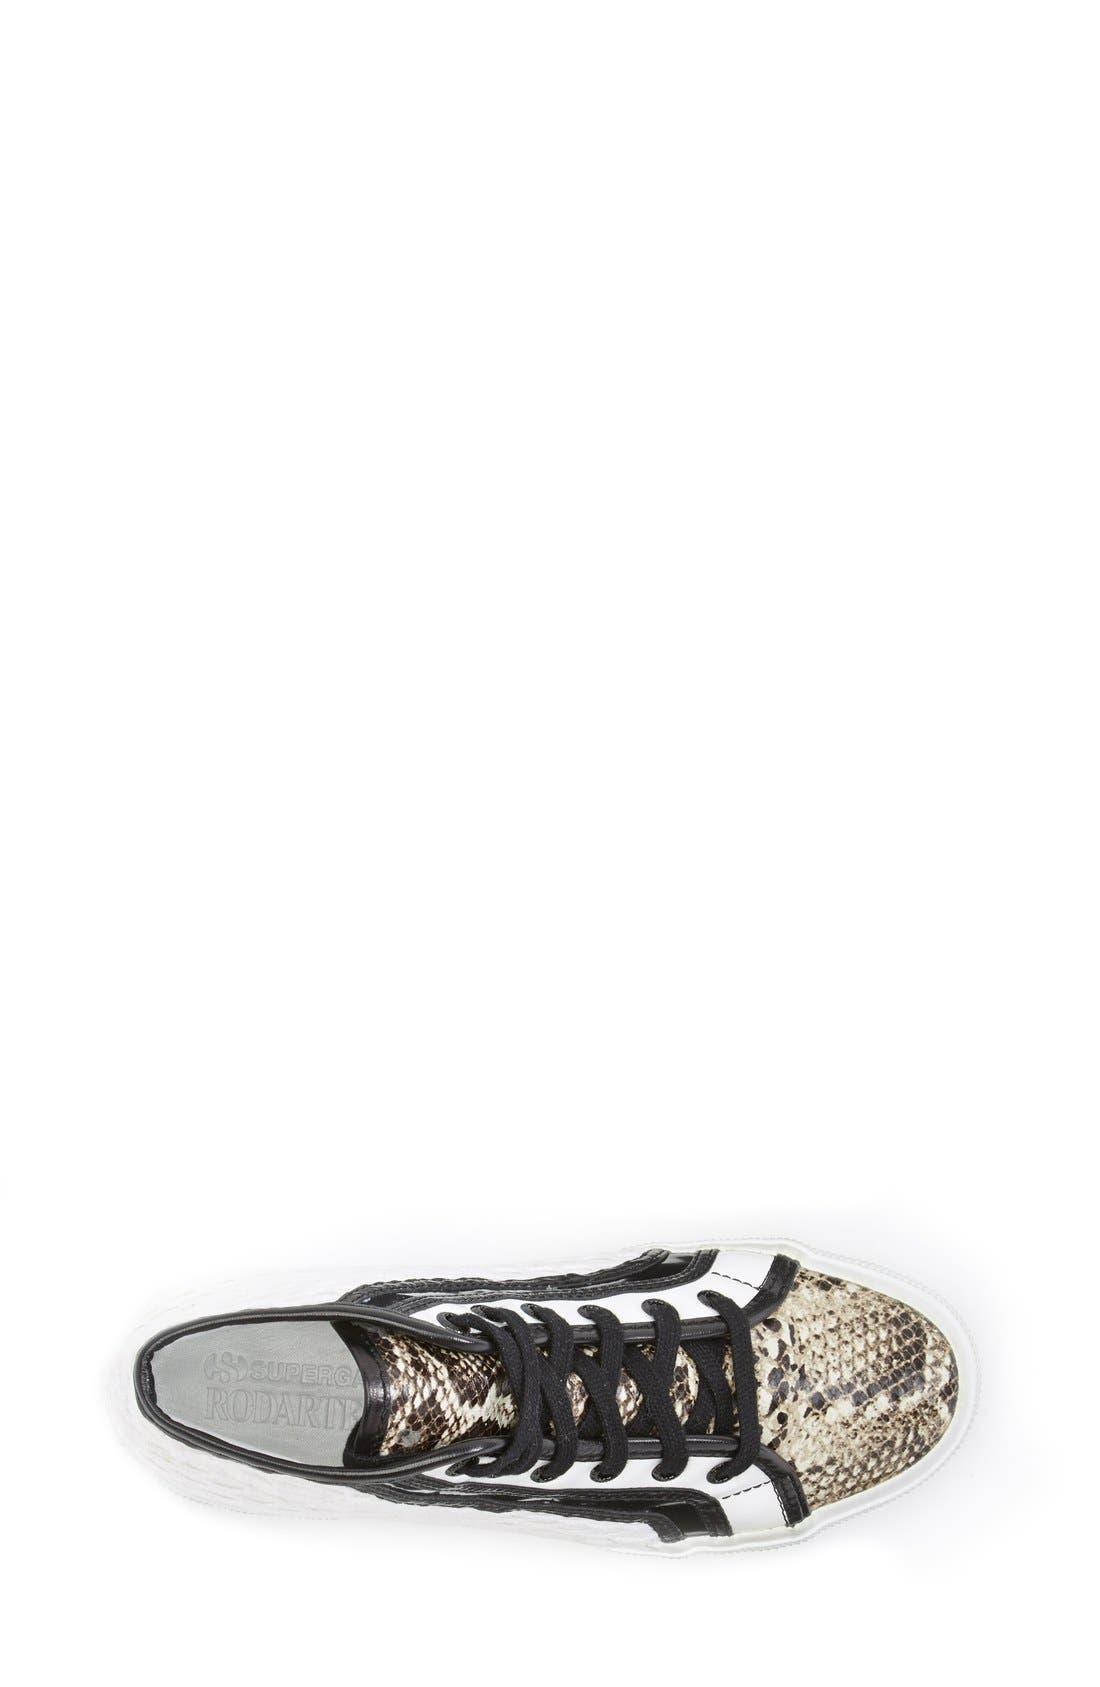 Alternate Image 3  - Superga Rodarte Mixed Media High Top Sneaker (Women)